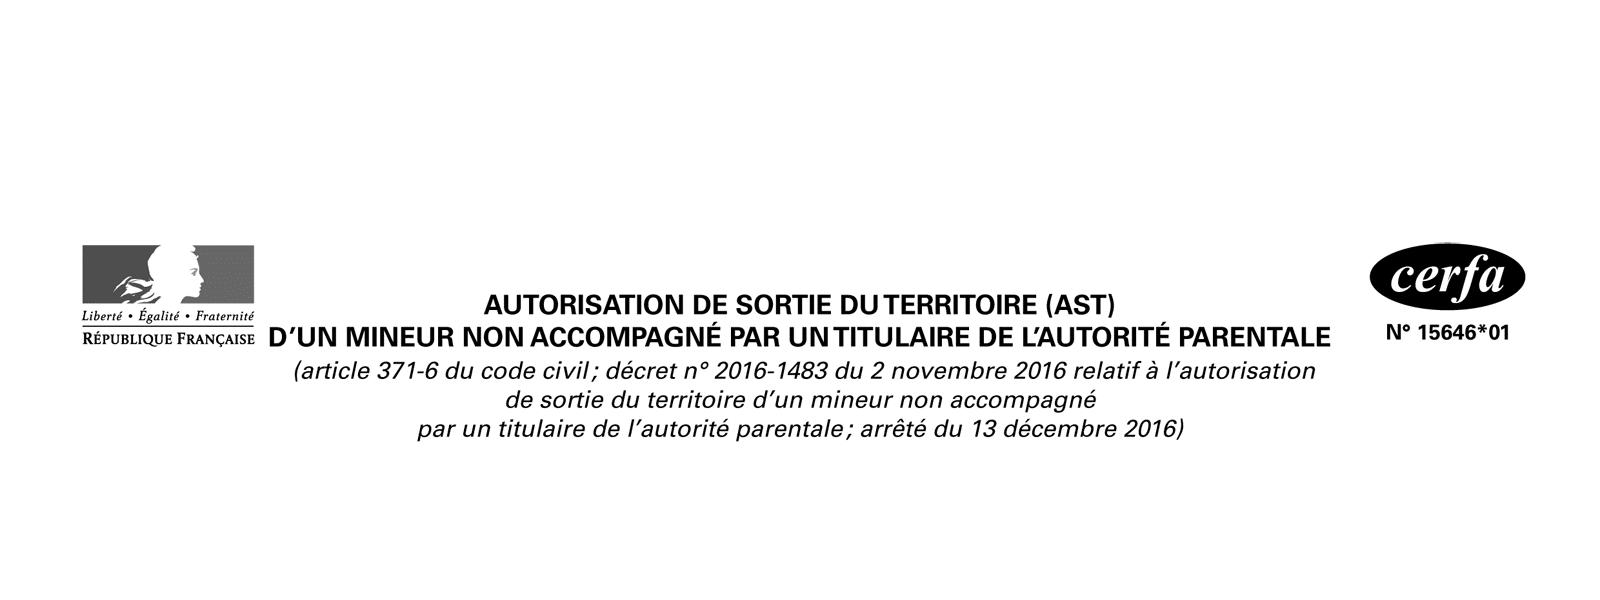 Autorisation de sortie du territoire (AST)